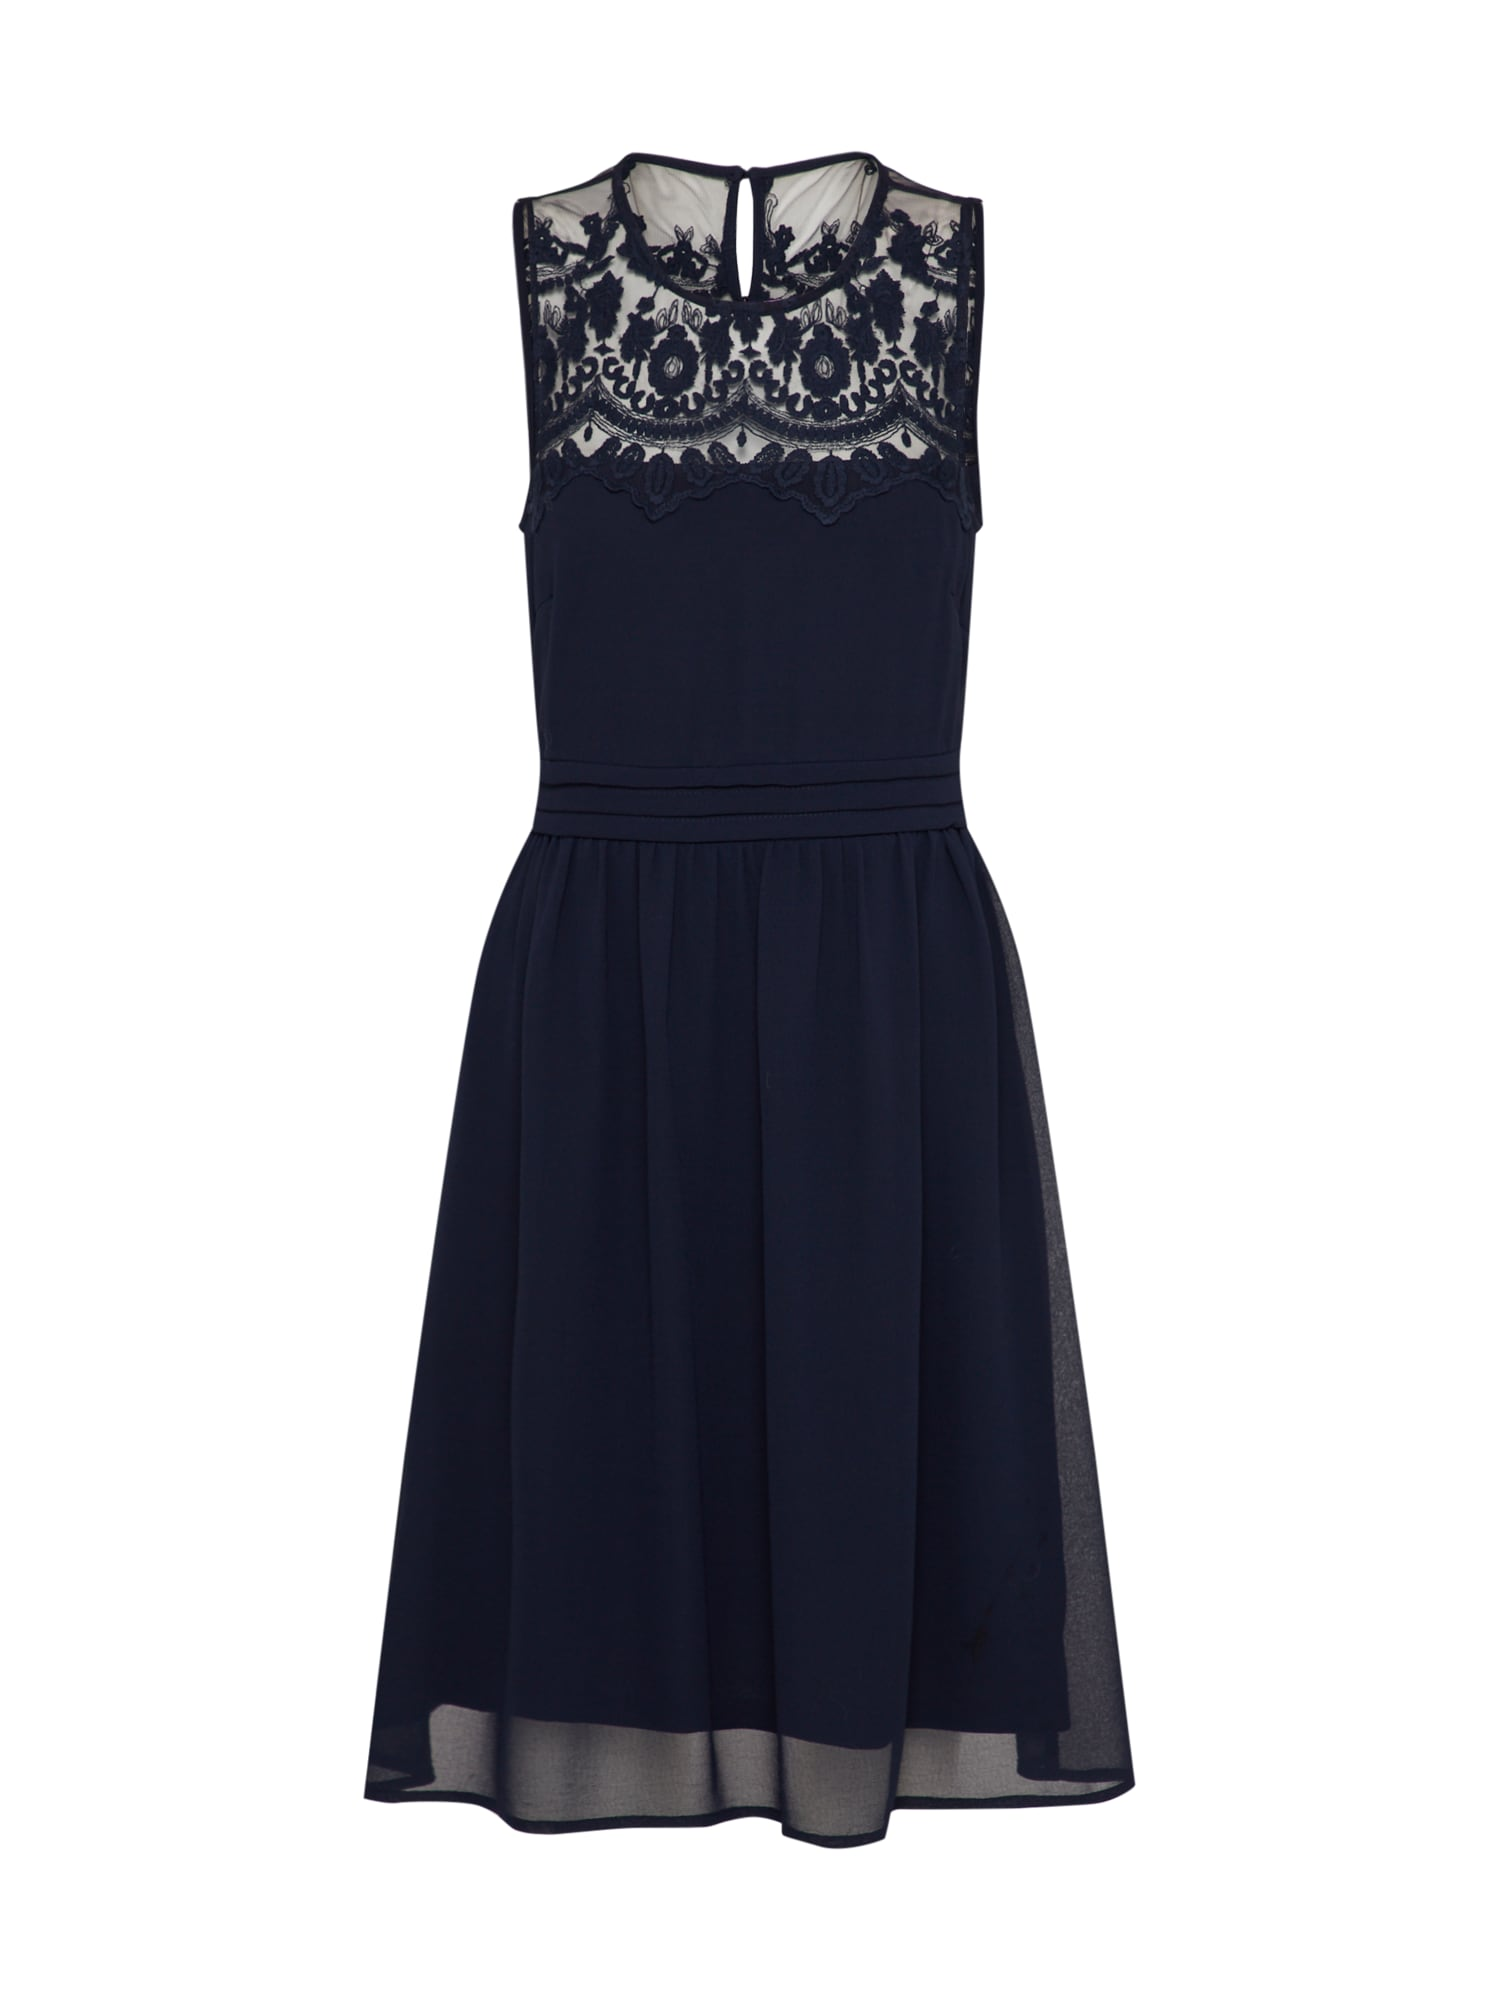 Koktejlové šaty Vanessa tmavě modrá VERO MODA